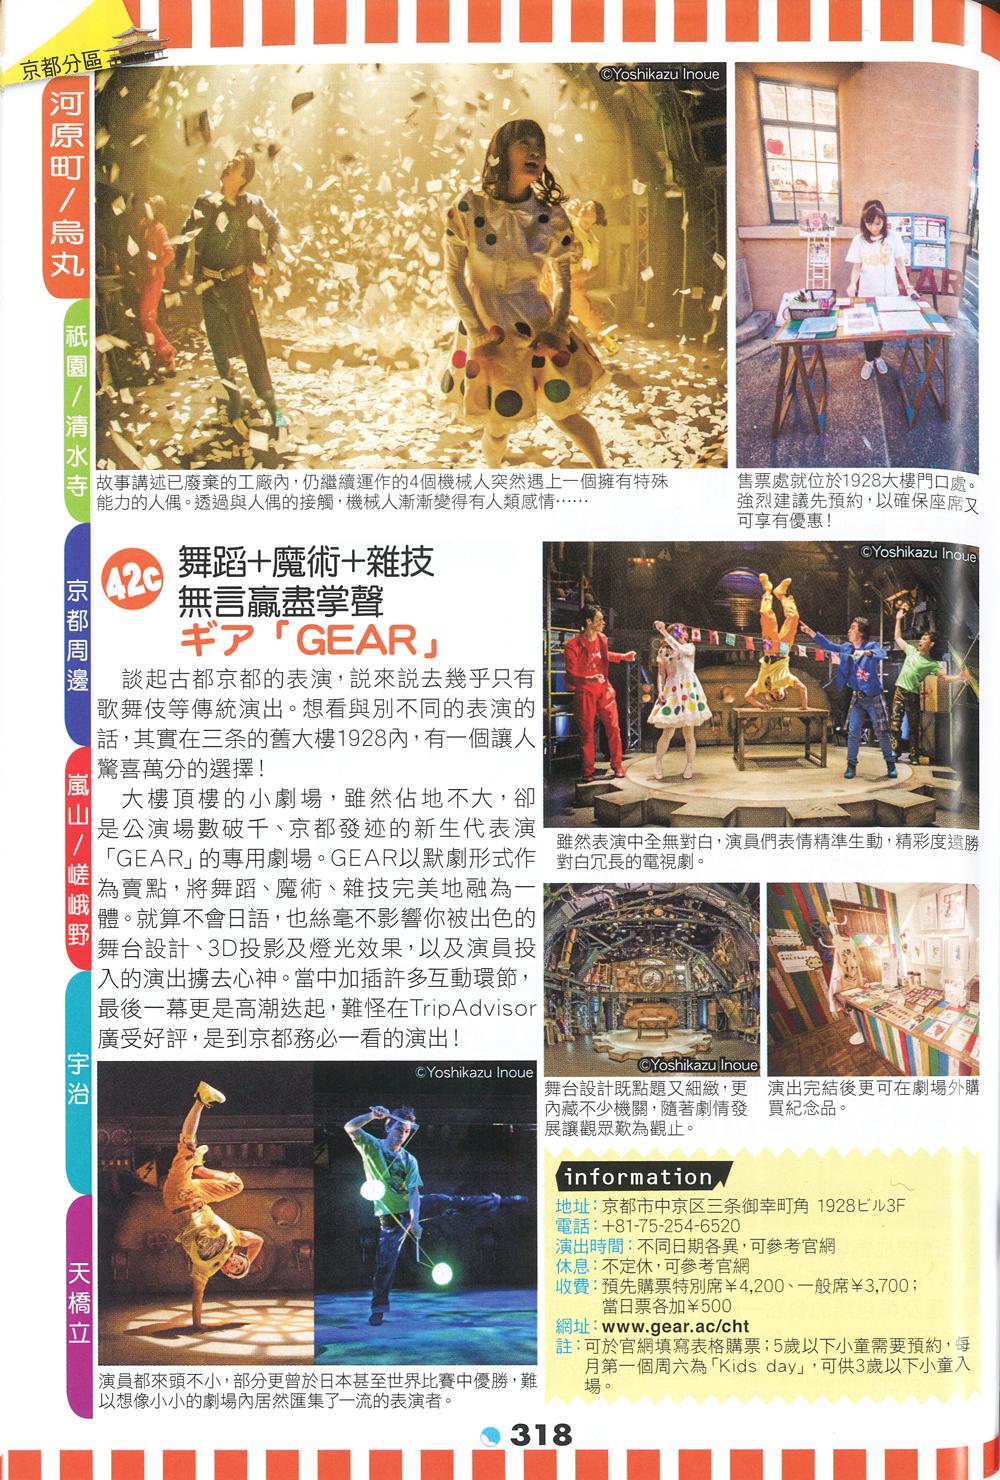 20151215-honkong2.jpg